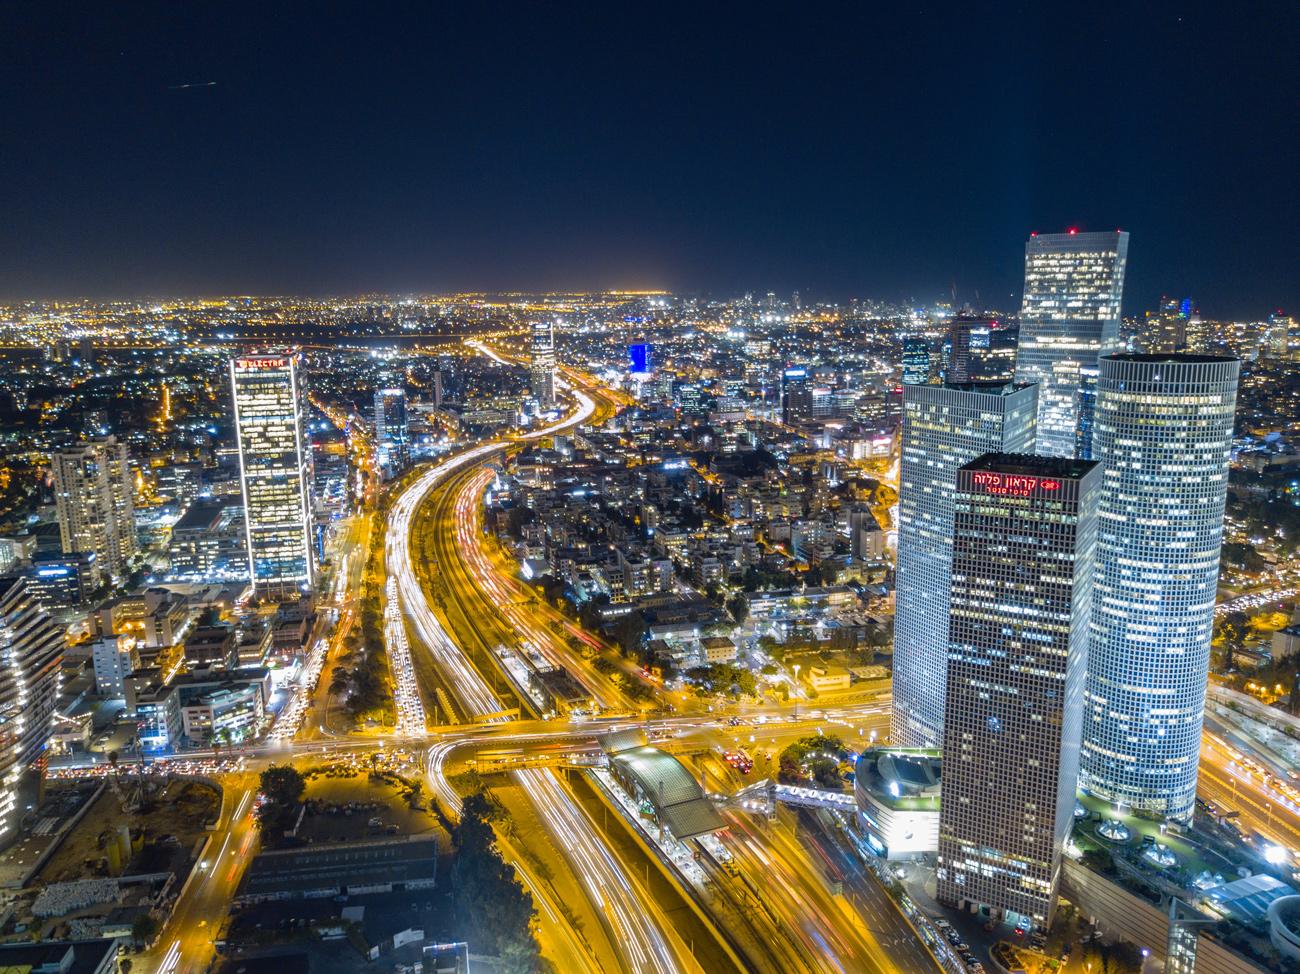 🇺🇦 🇮🇱 Відбудеться Ukrainian Israeli Innovation Summit — онлайн/офлайн захід